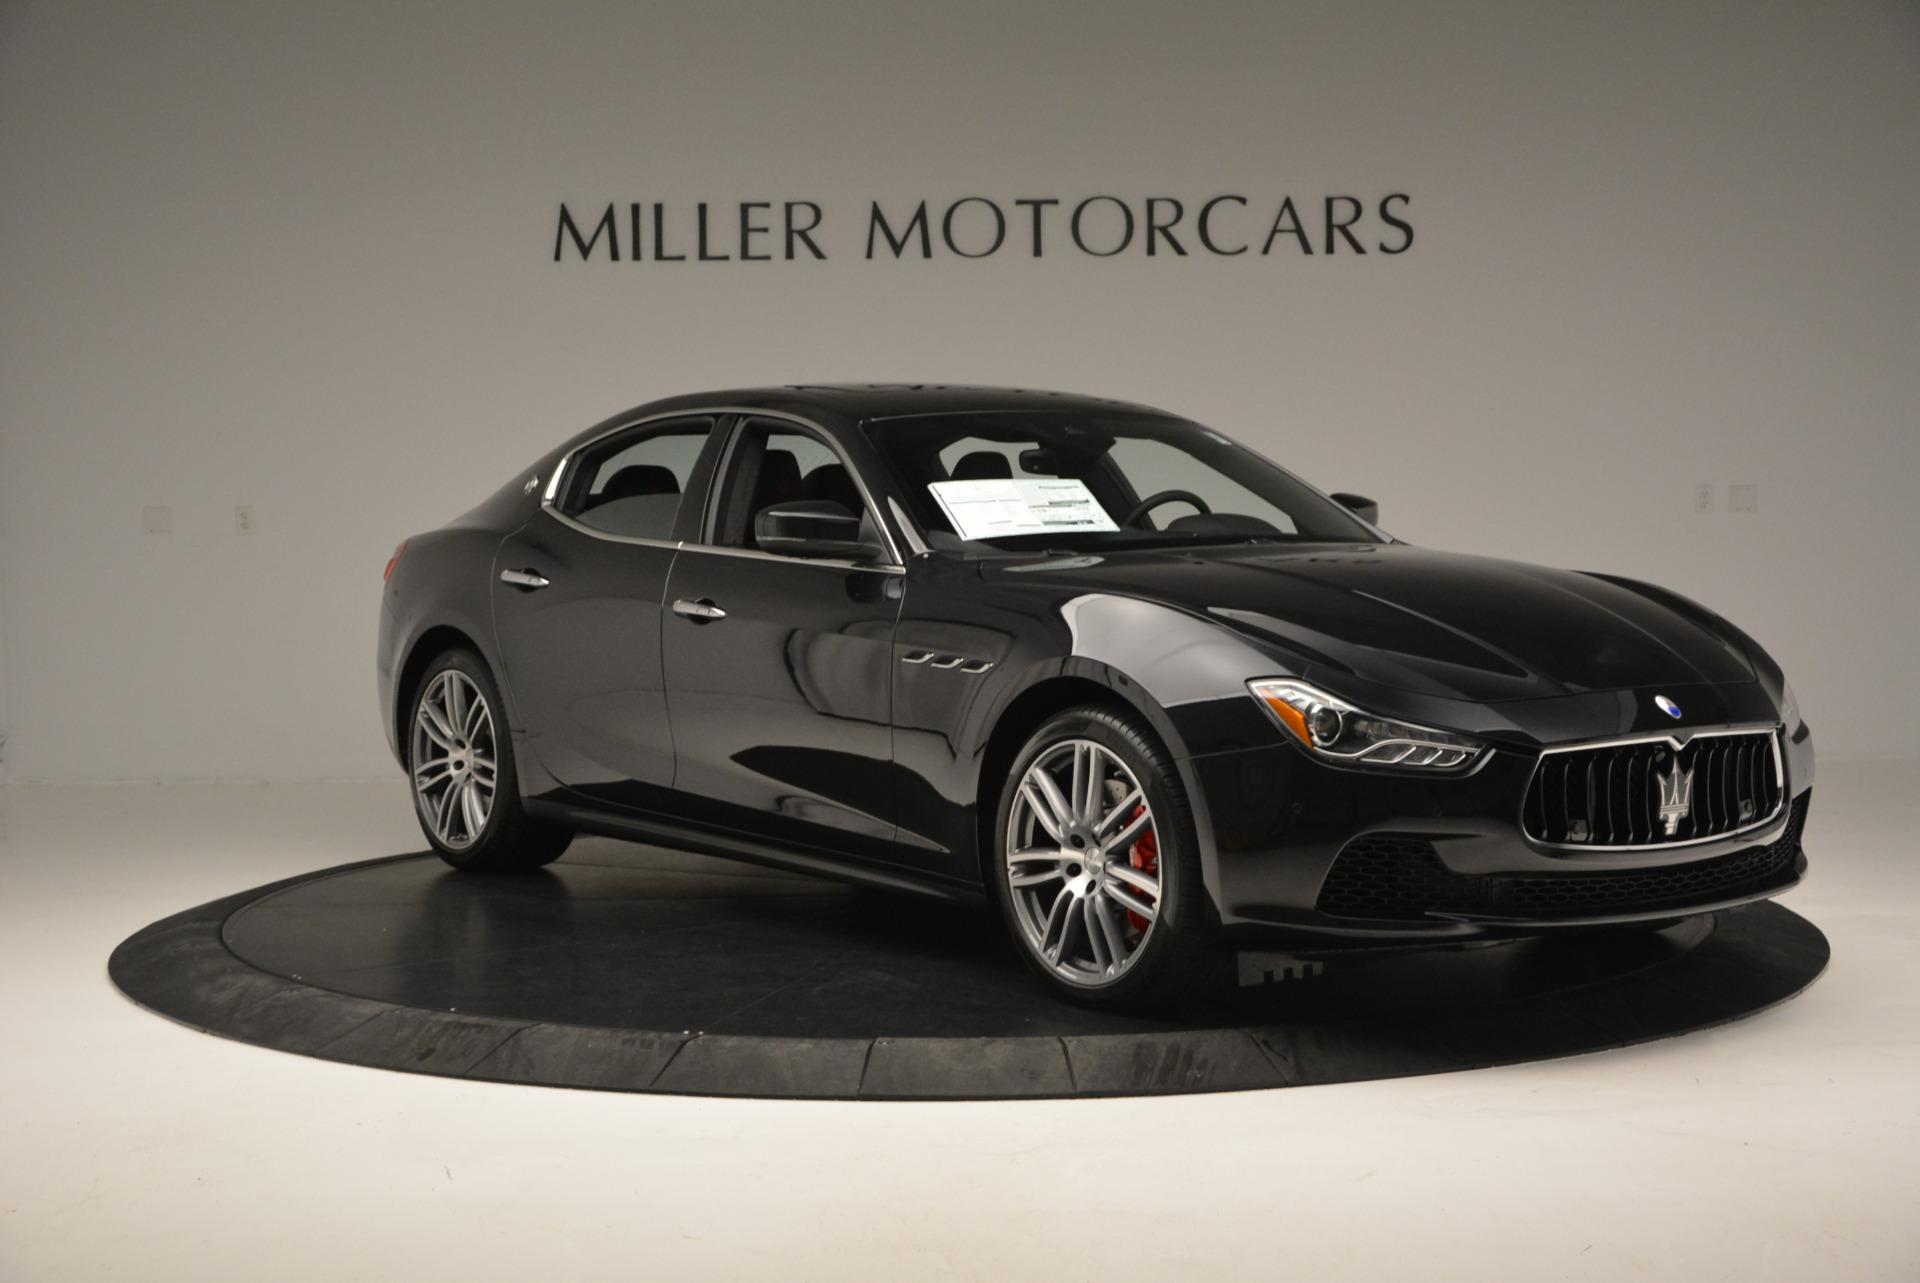 New 2017 Maserati Ghibli S Q4 For Sale In Westport, CT 630_p11